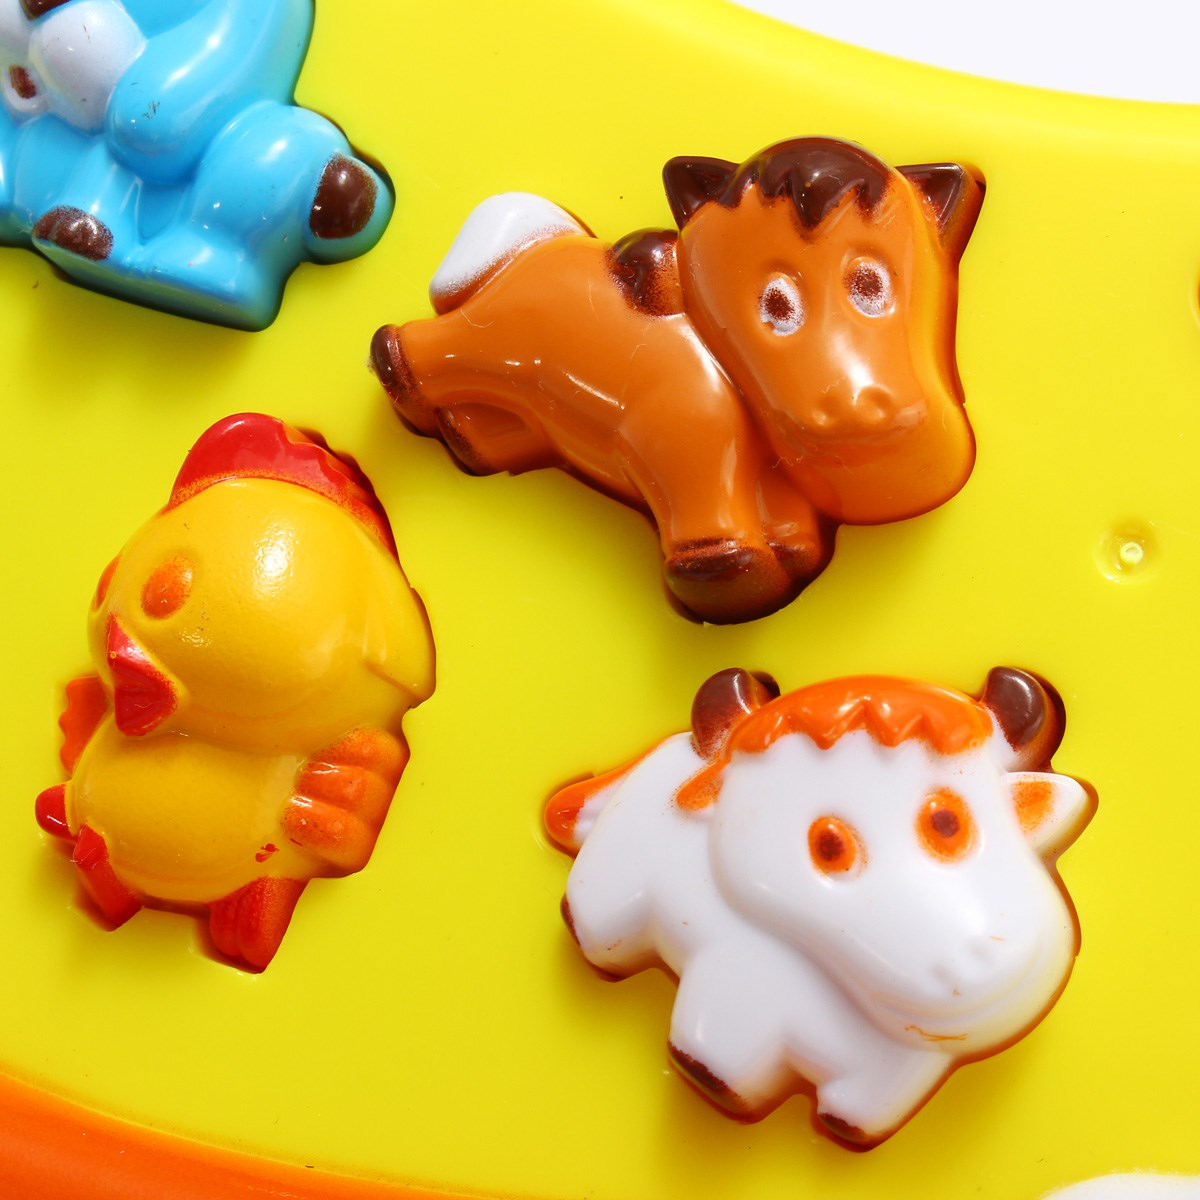 Funny-Lovely-Baby-Children-Kids-Musical-Educational-Animal-Farm-Piano-Toys-Developmental-Music-Toy-For-Children-4